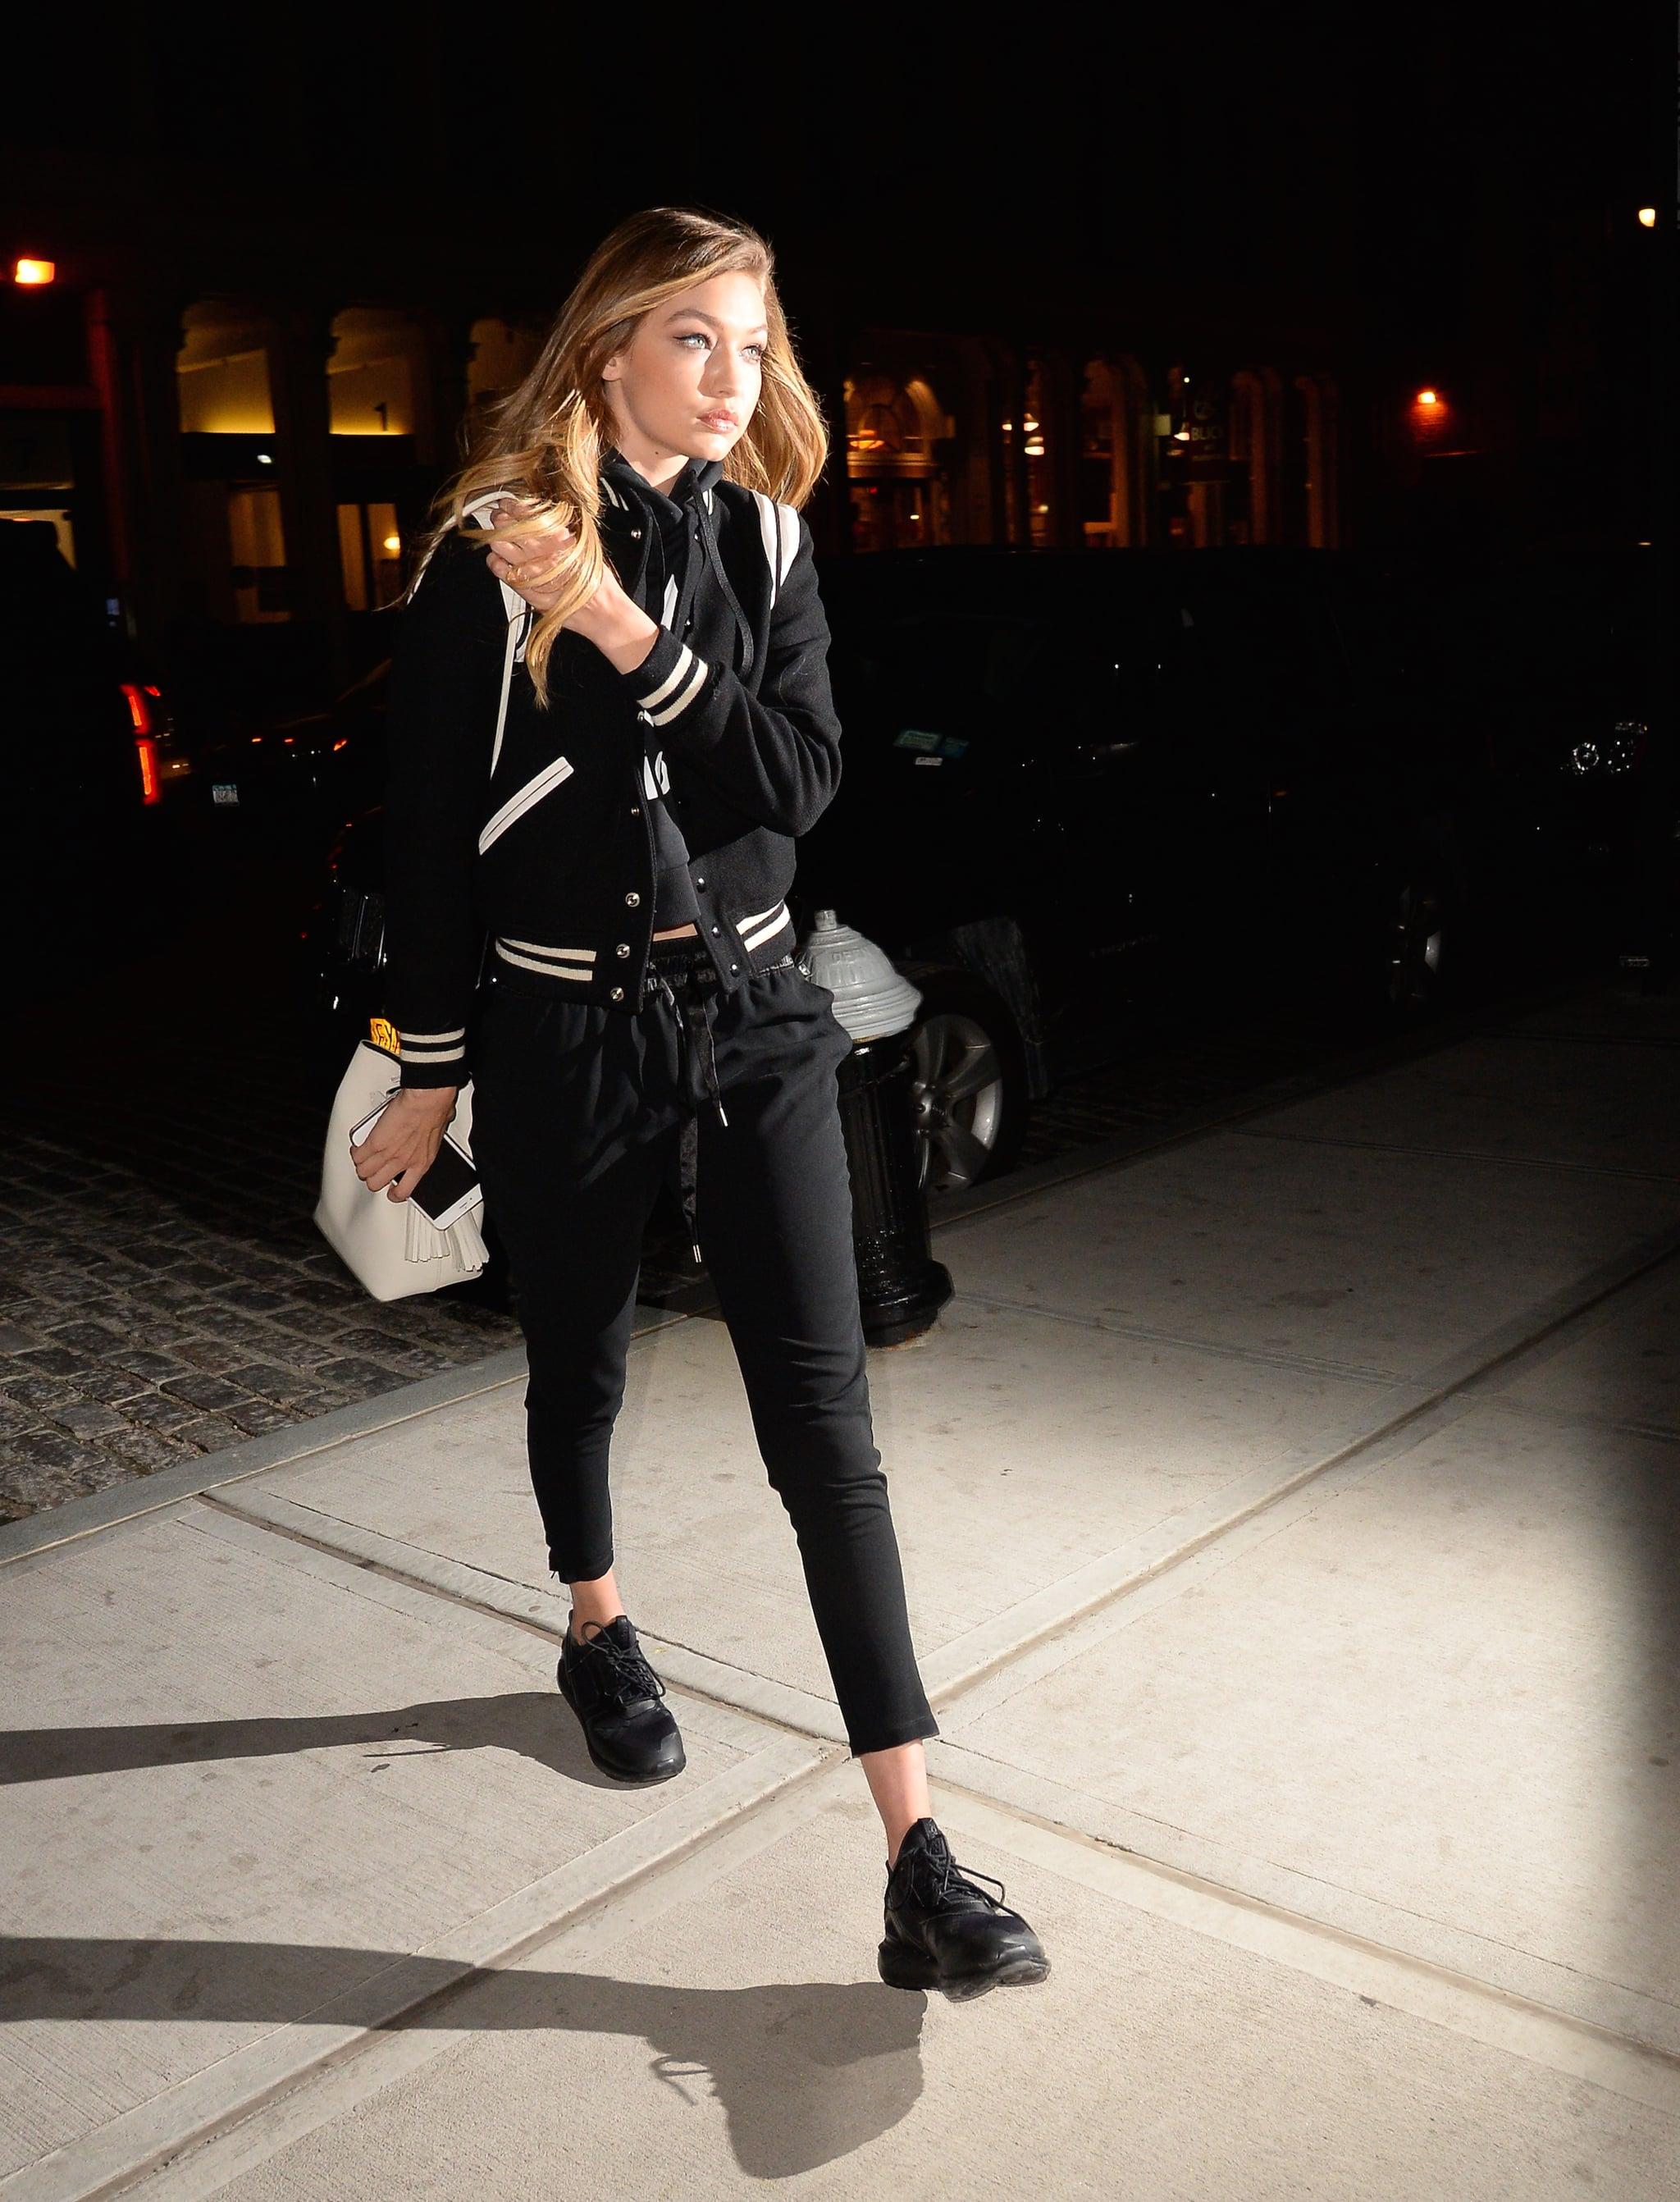 Gigi Hadid Stepped Out Wearing a Sleek Black Pair of